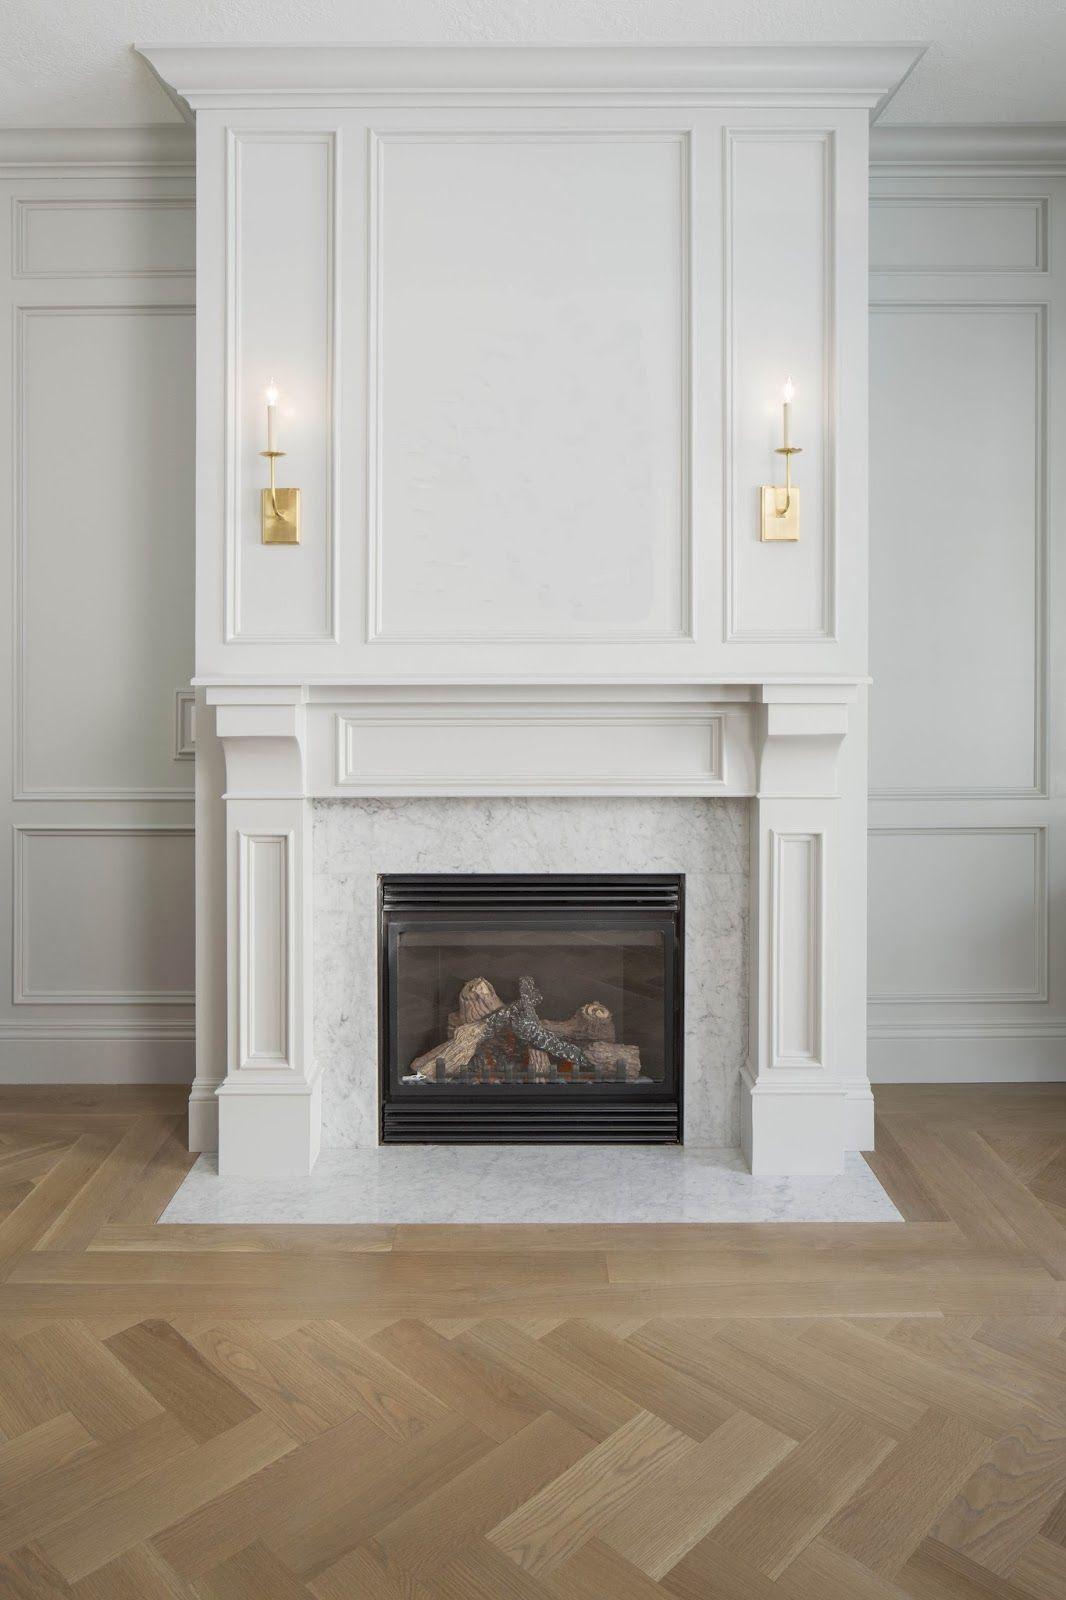 Interesting Combination Of Multi Directional And Herringbone Wood Floor Patterns